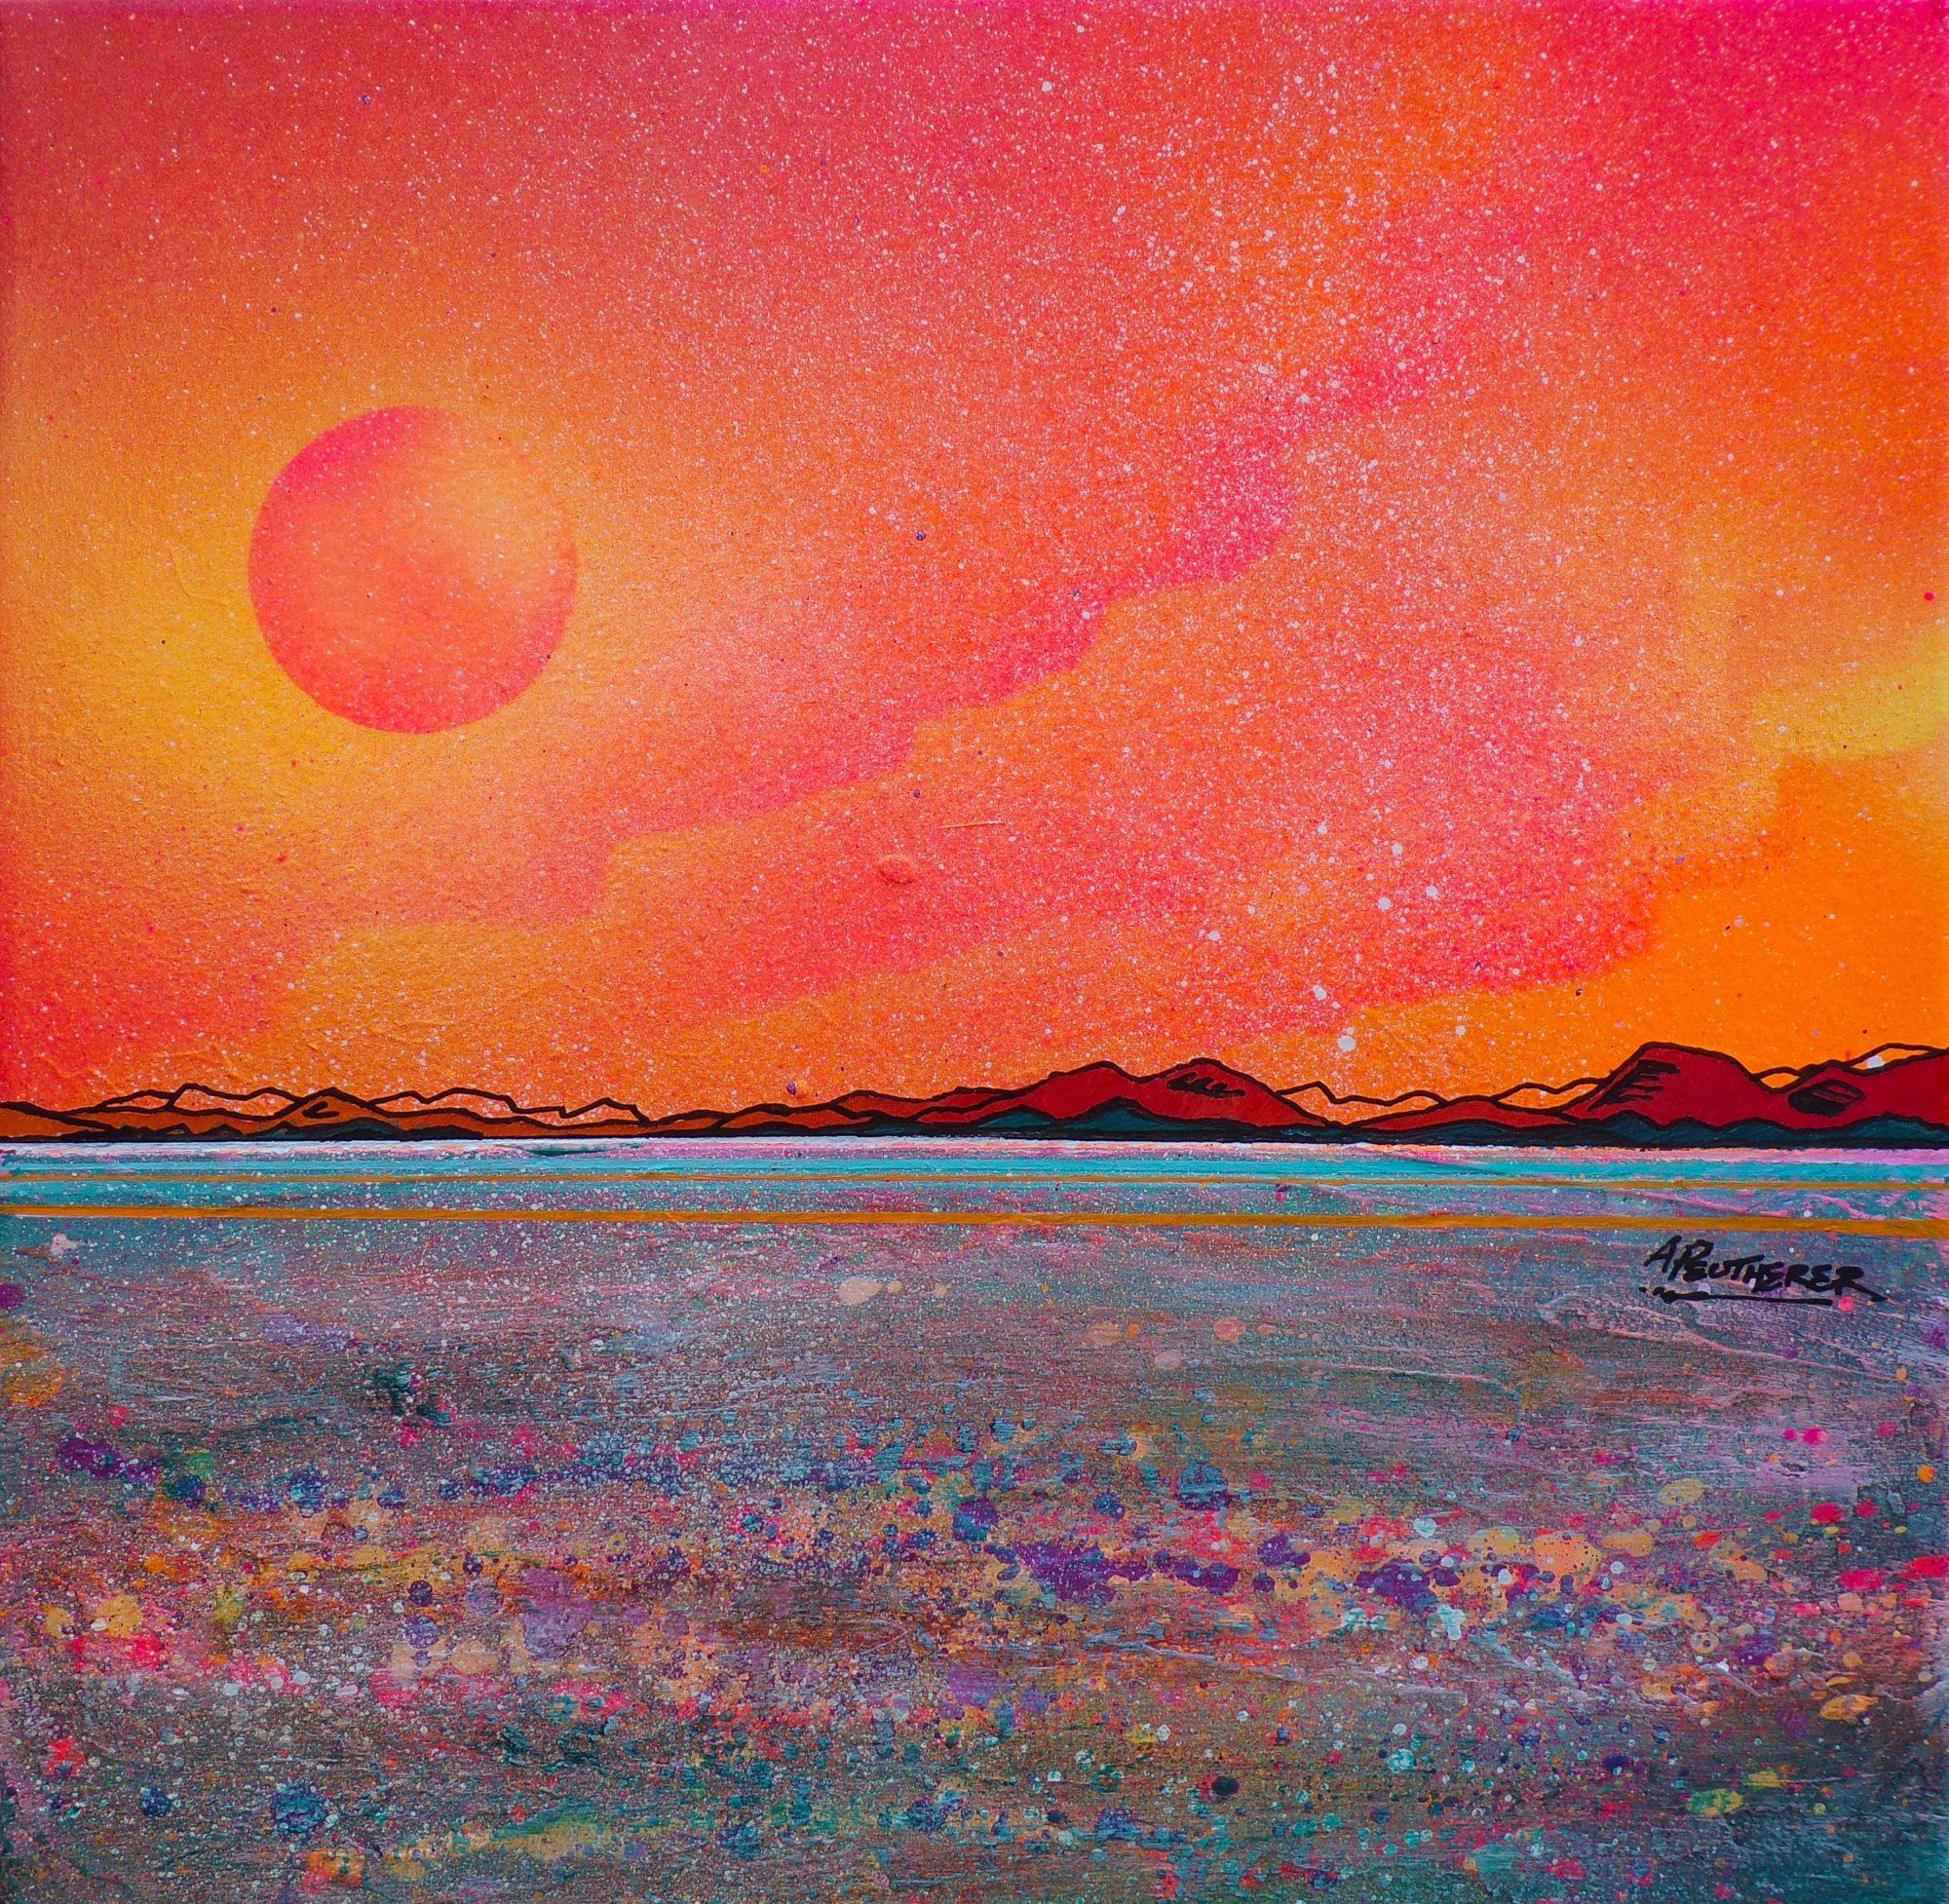 Sanna Bay, Ardnamurchan, Scotland - original Painting Canvas & Art Prints